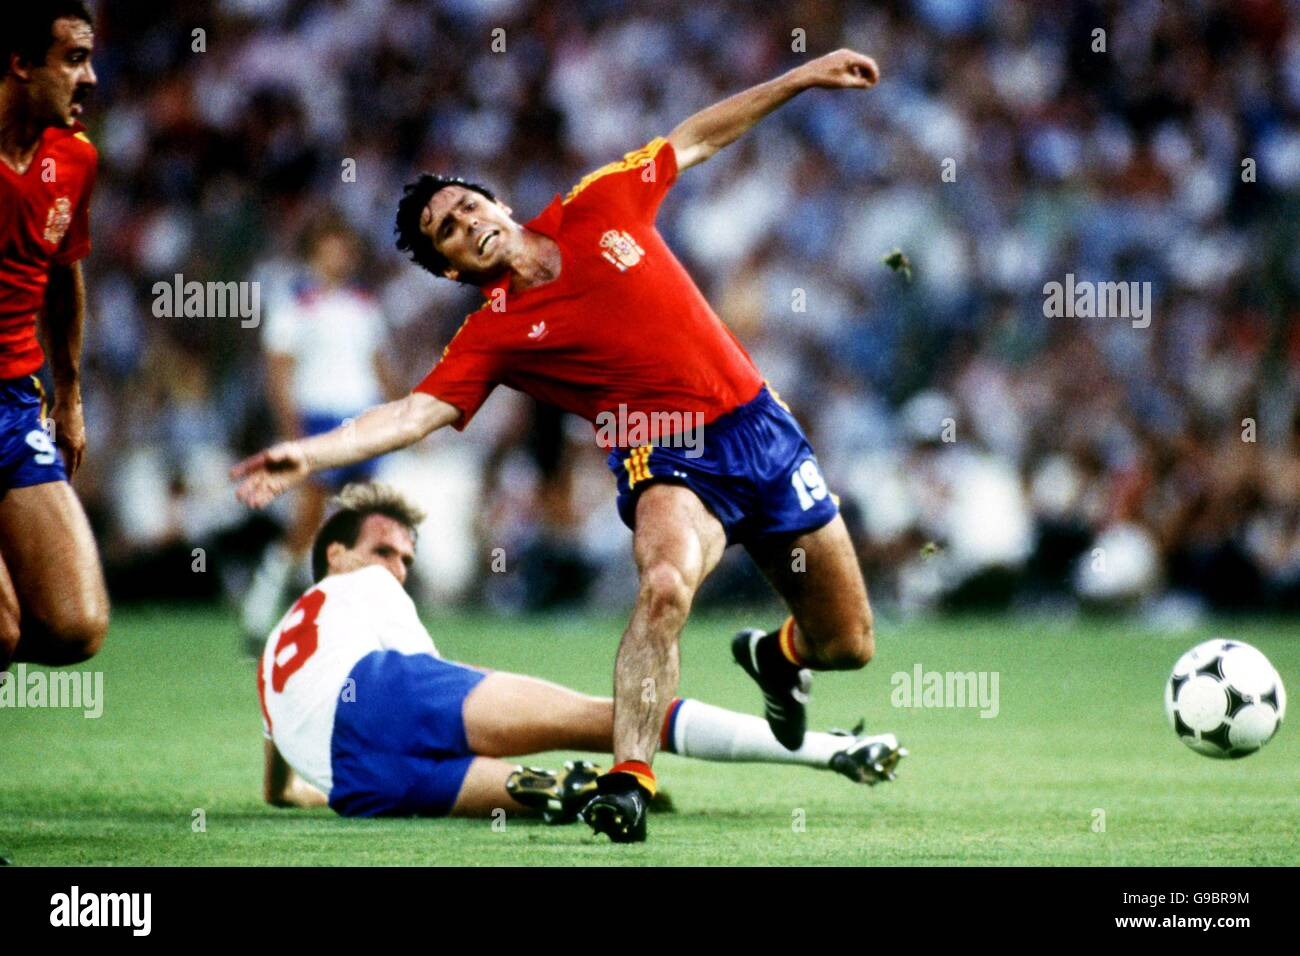 Football Coupe Du Monde Espagne 82 Groupe B Angleterre